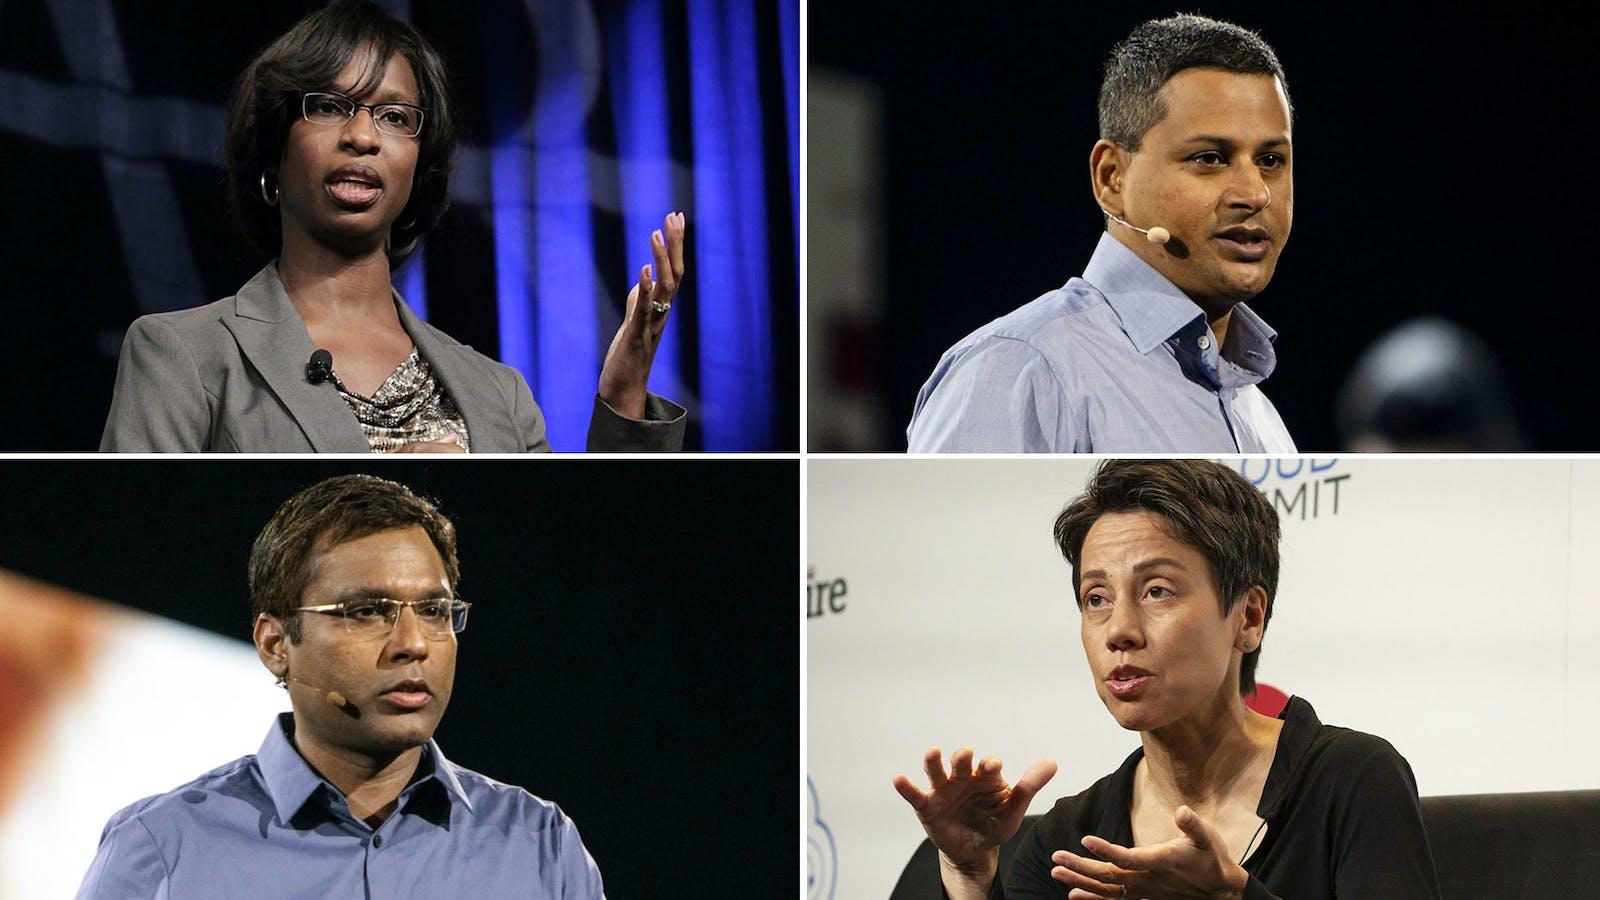 Clockwise from top-left: Alicia Boler Davis, Dilip Kumar, Mai-Lan Tomsen Bukovec and Rohit Prasad. Photos by Bloomberg